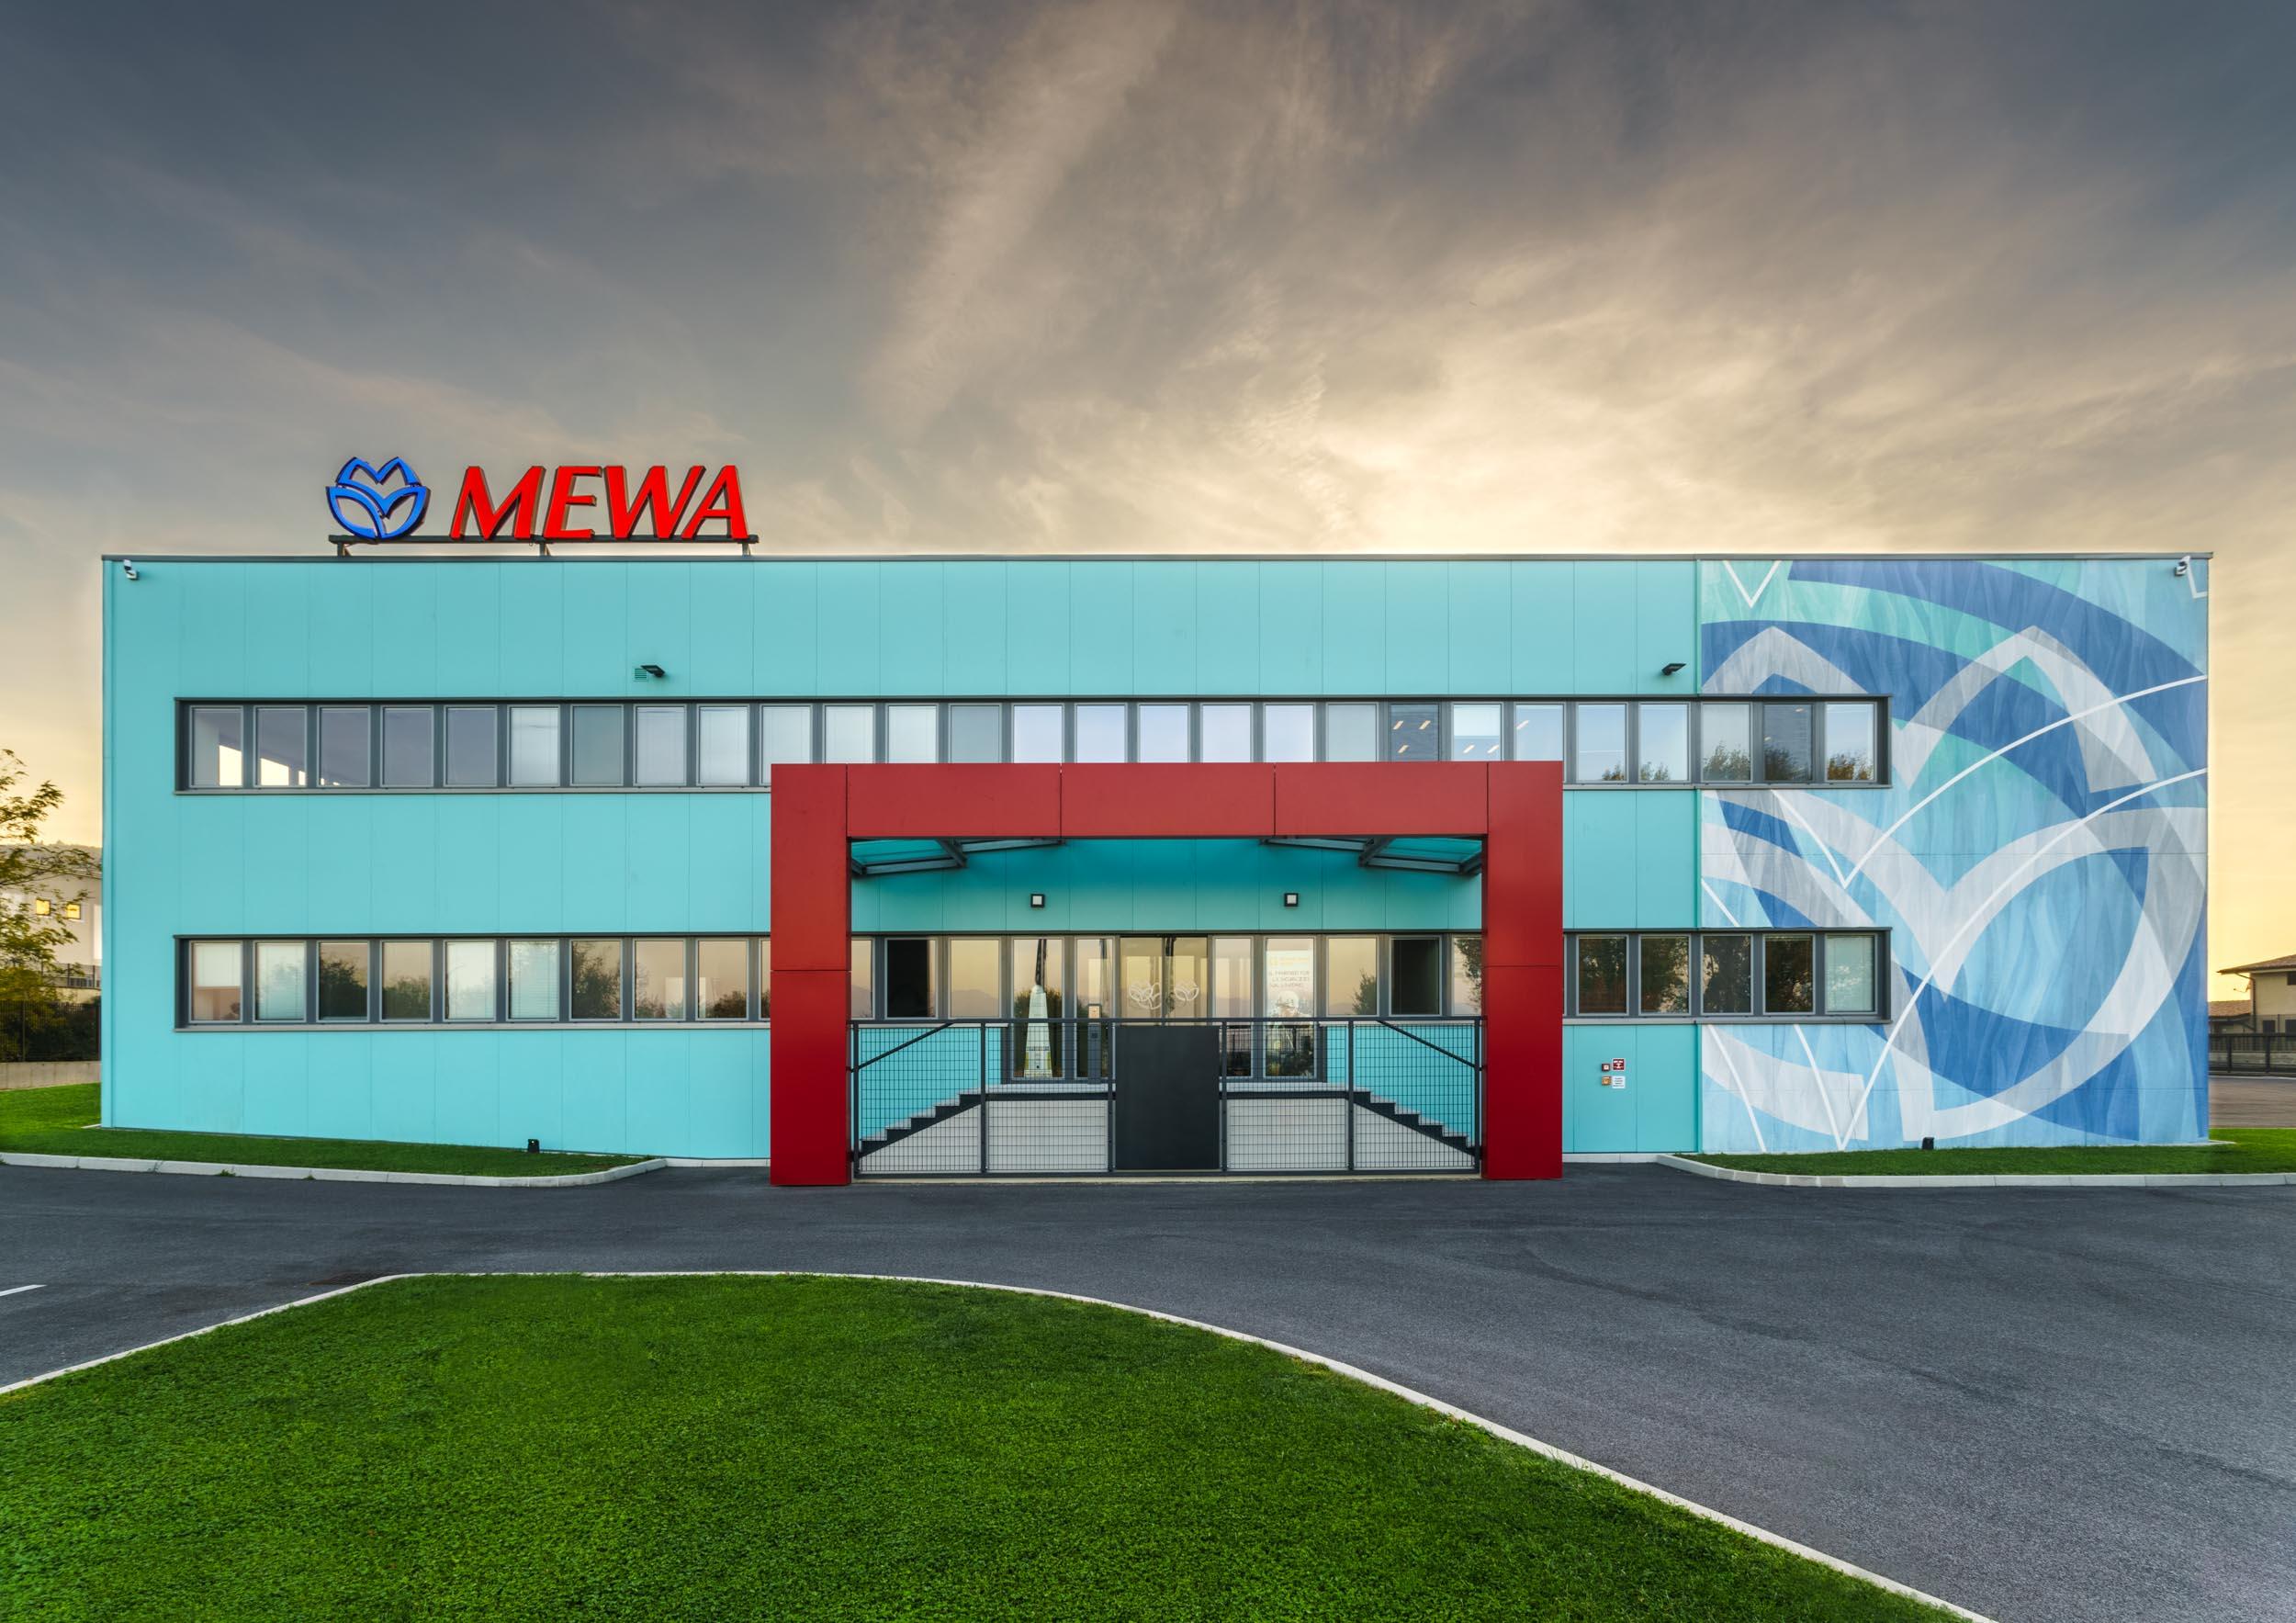 001-Mewa_GAB0640-HDRM-Gabriele Lungarella.jpg